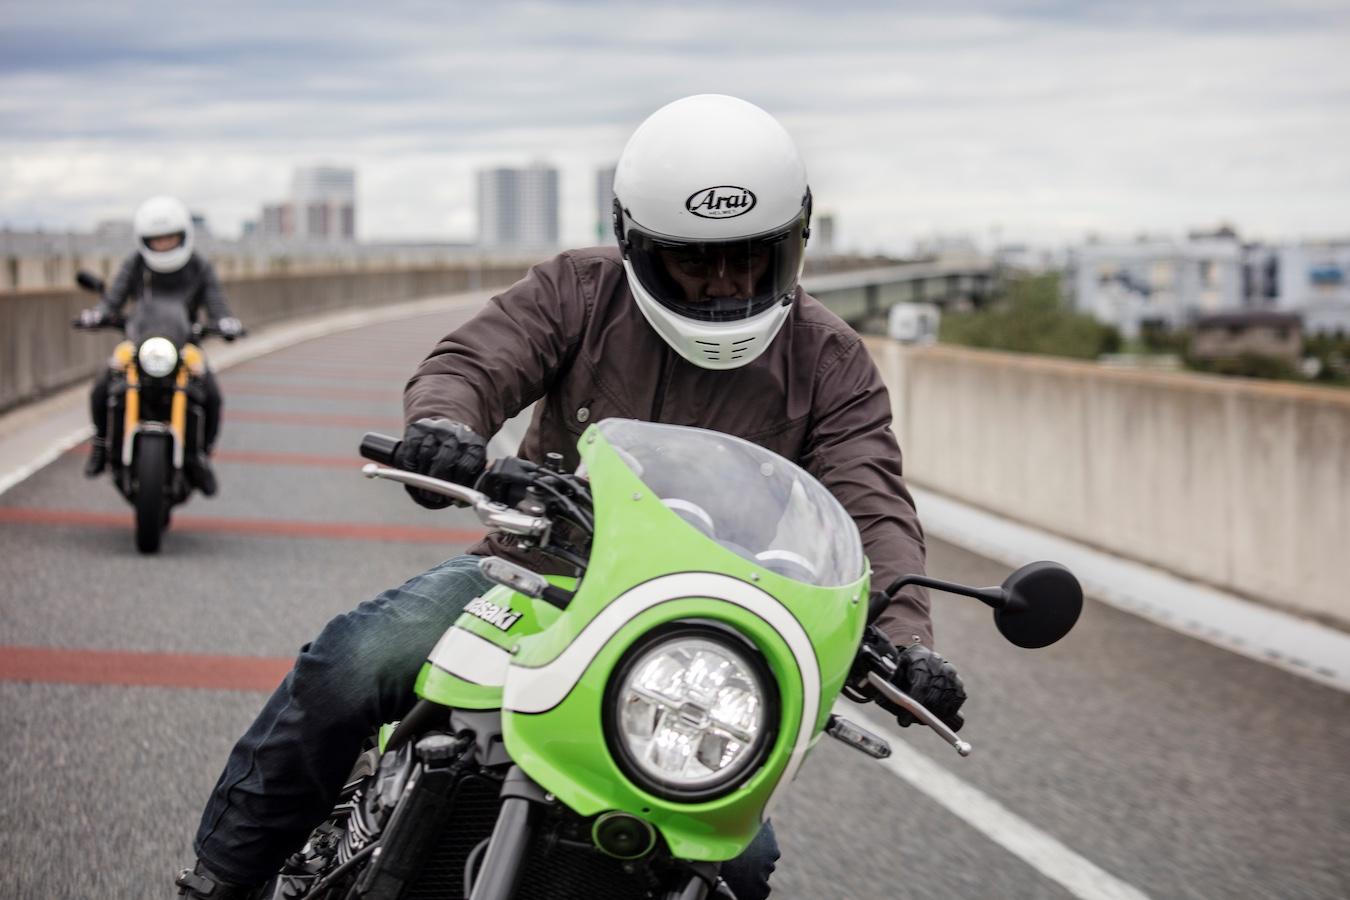 Rider on Kawasaki Z900 RS wearing white Arai Rapide helmet